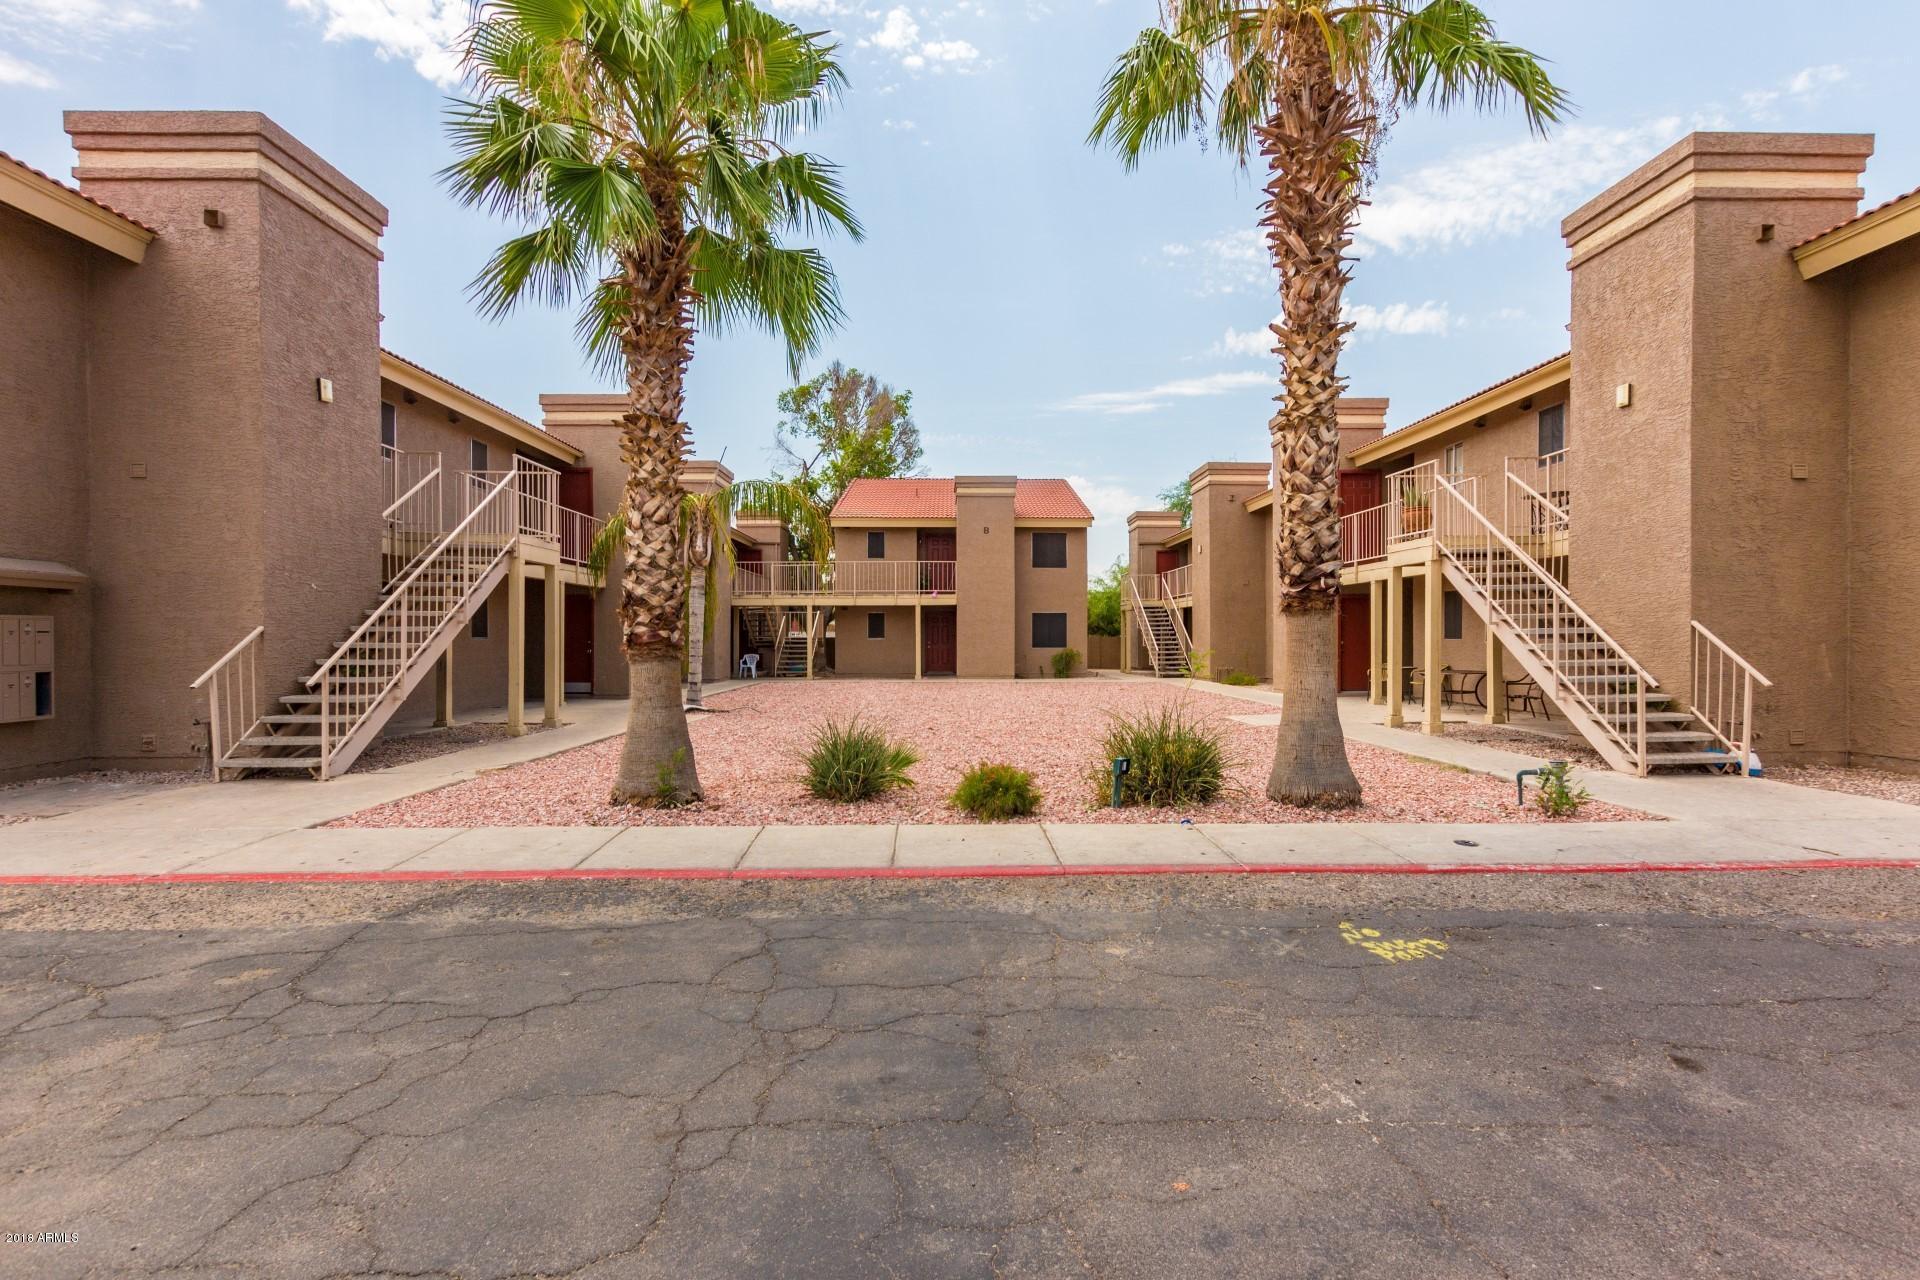 Photo of 5233 W Myrtle Avenue #103, Glendale, AZ 85301